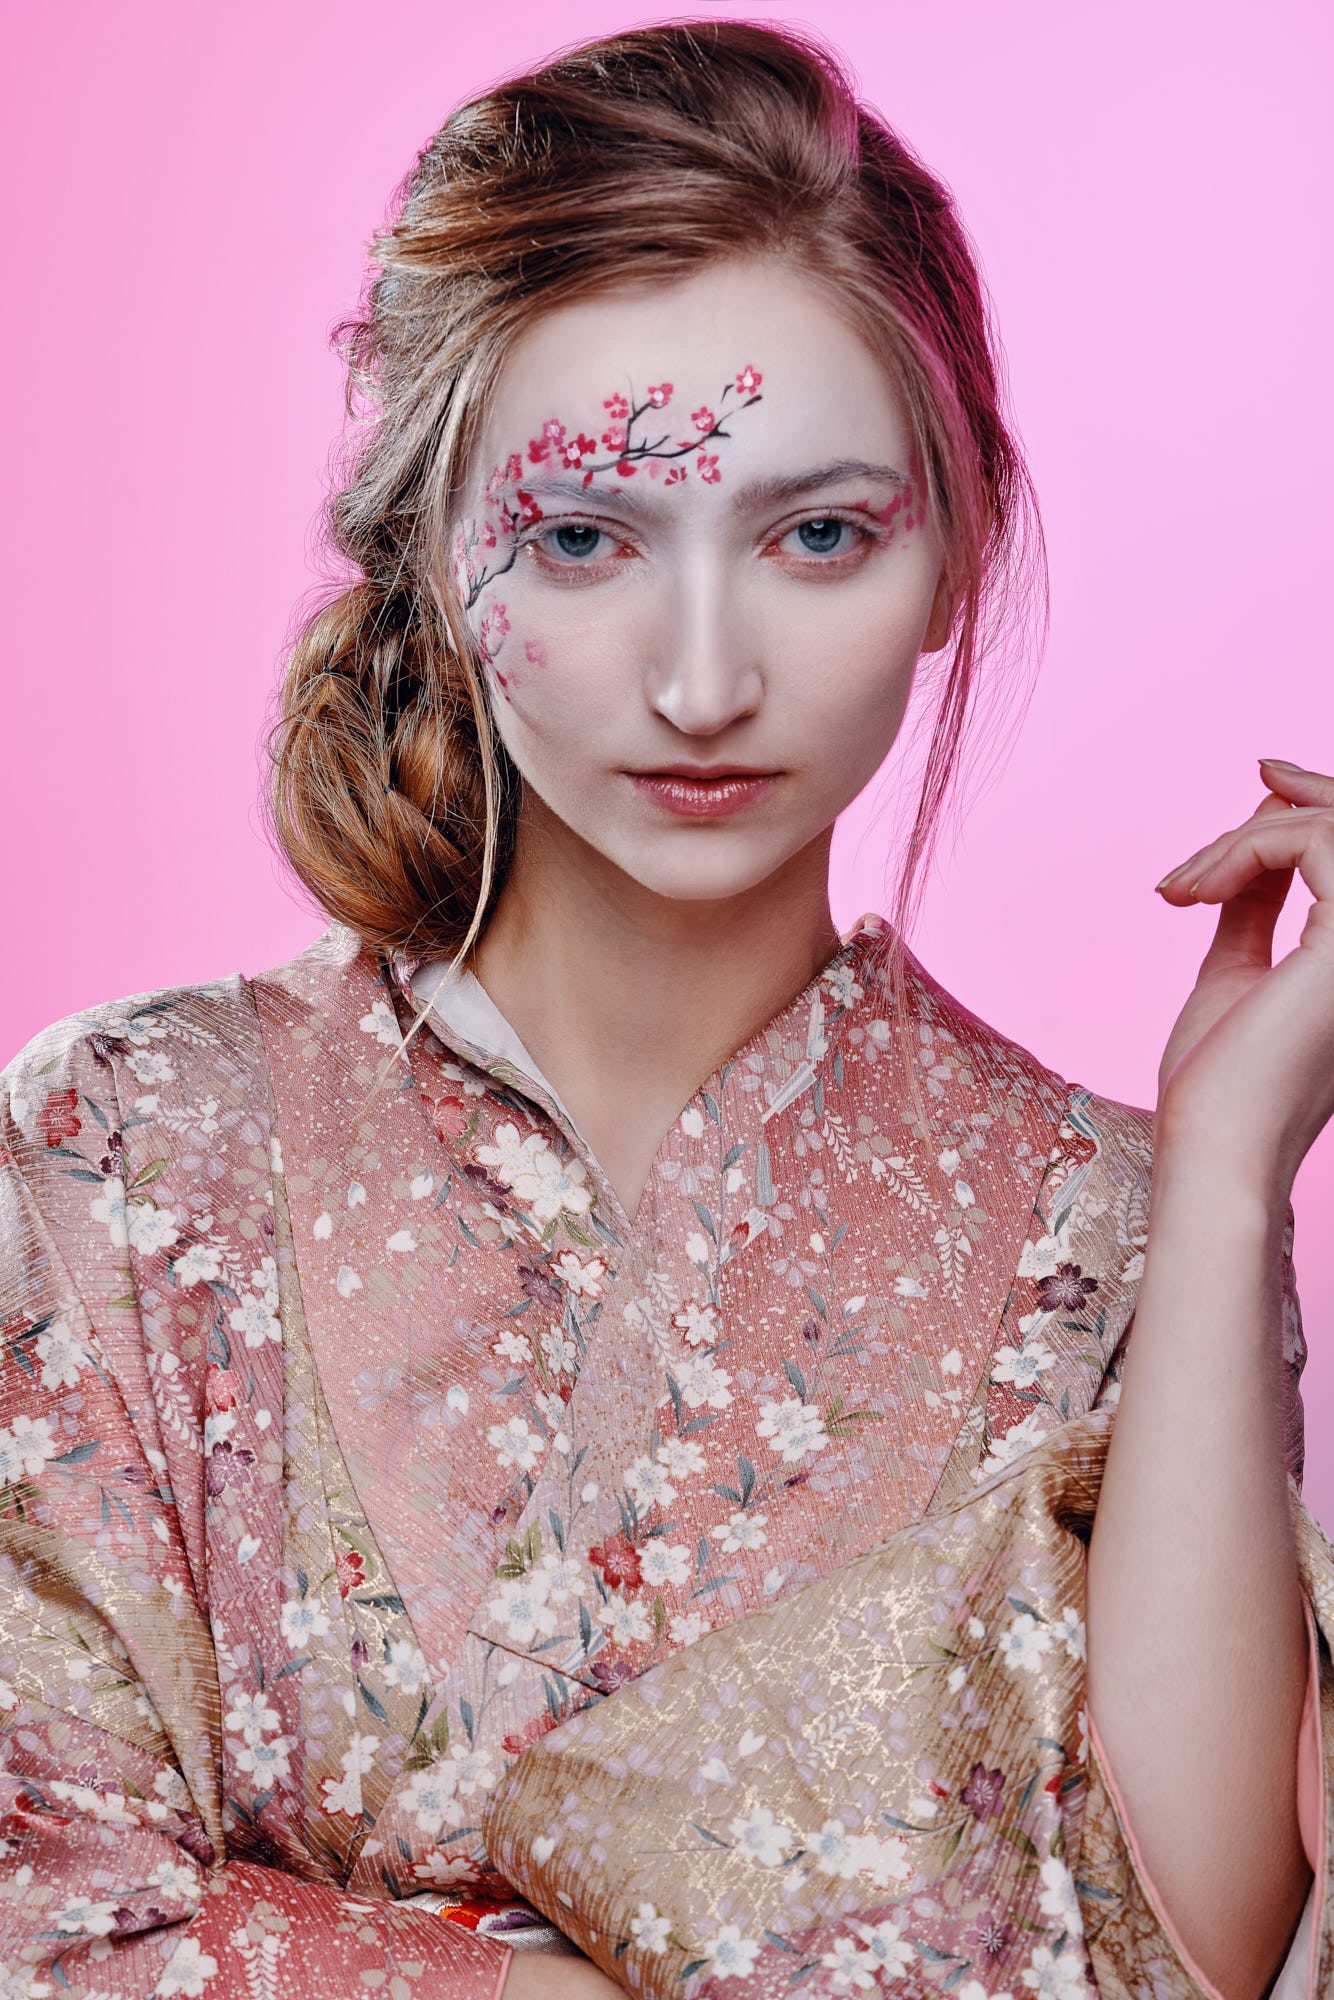 Lex & Josh Tiffanys Pro Makeup Spring Studio Shoot with Mika 1.jpg